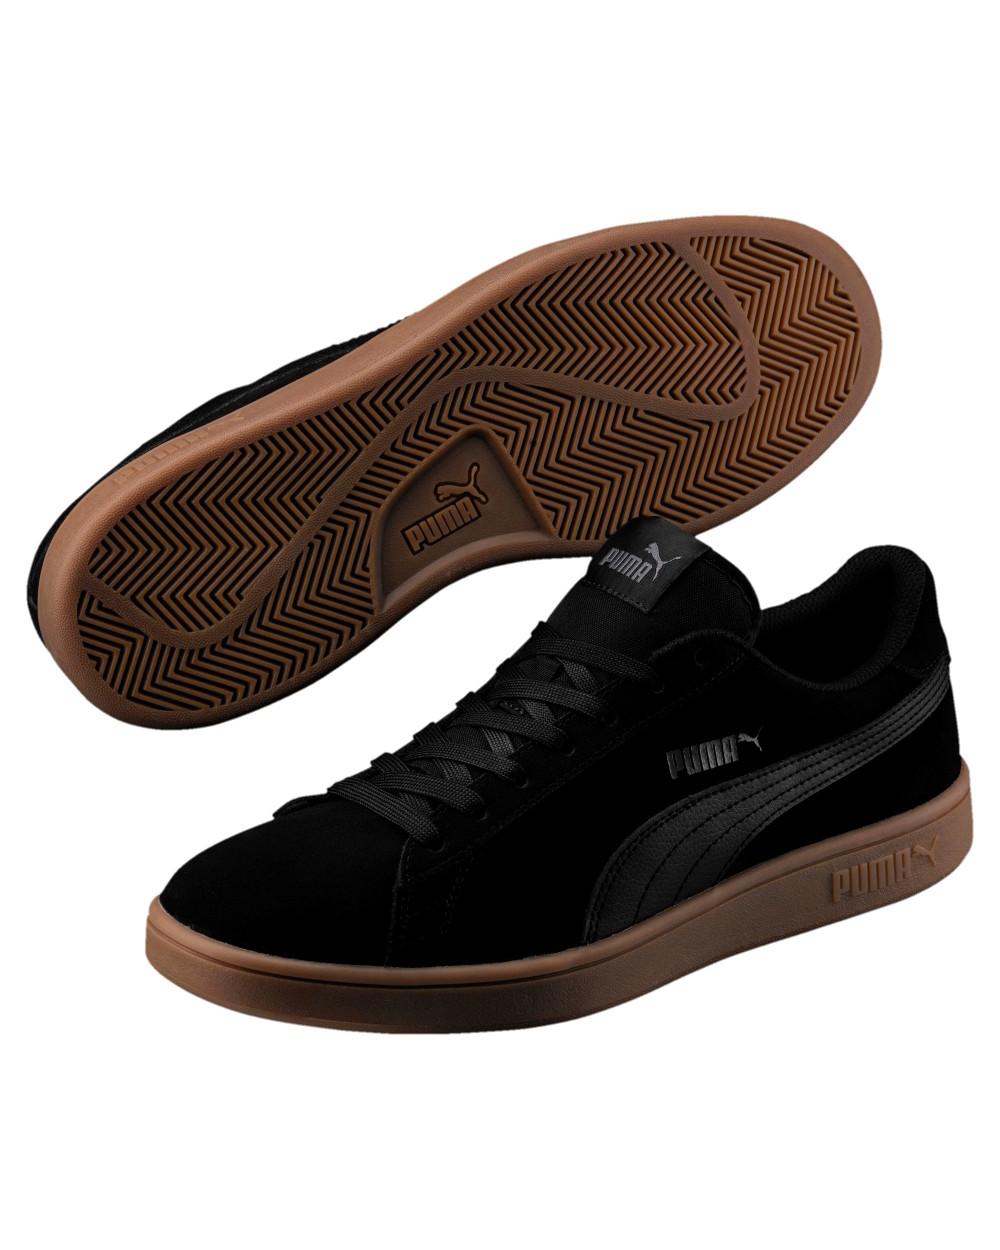 Puma Schuhe Schuhe Puma Sneakers Sportive Sportswear Smash v2 nobuck Nero 9c0175